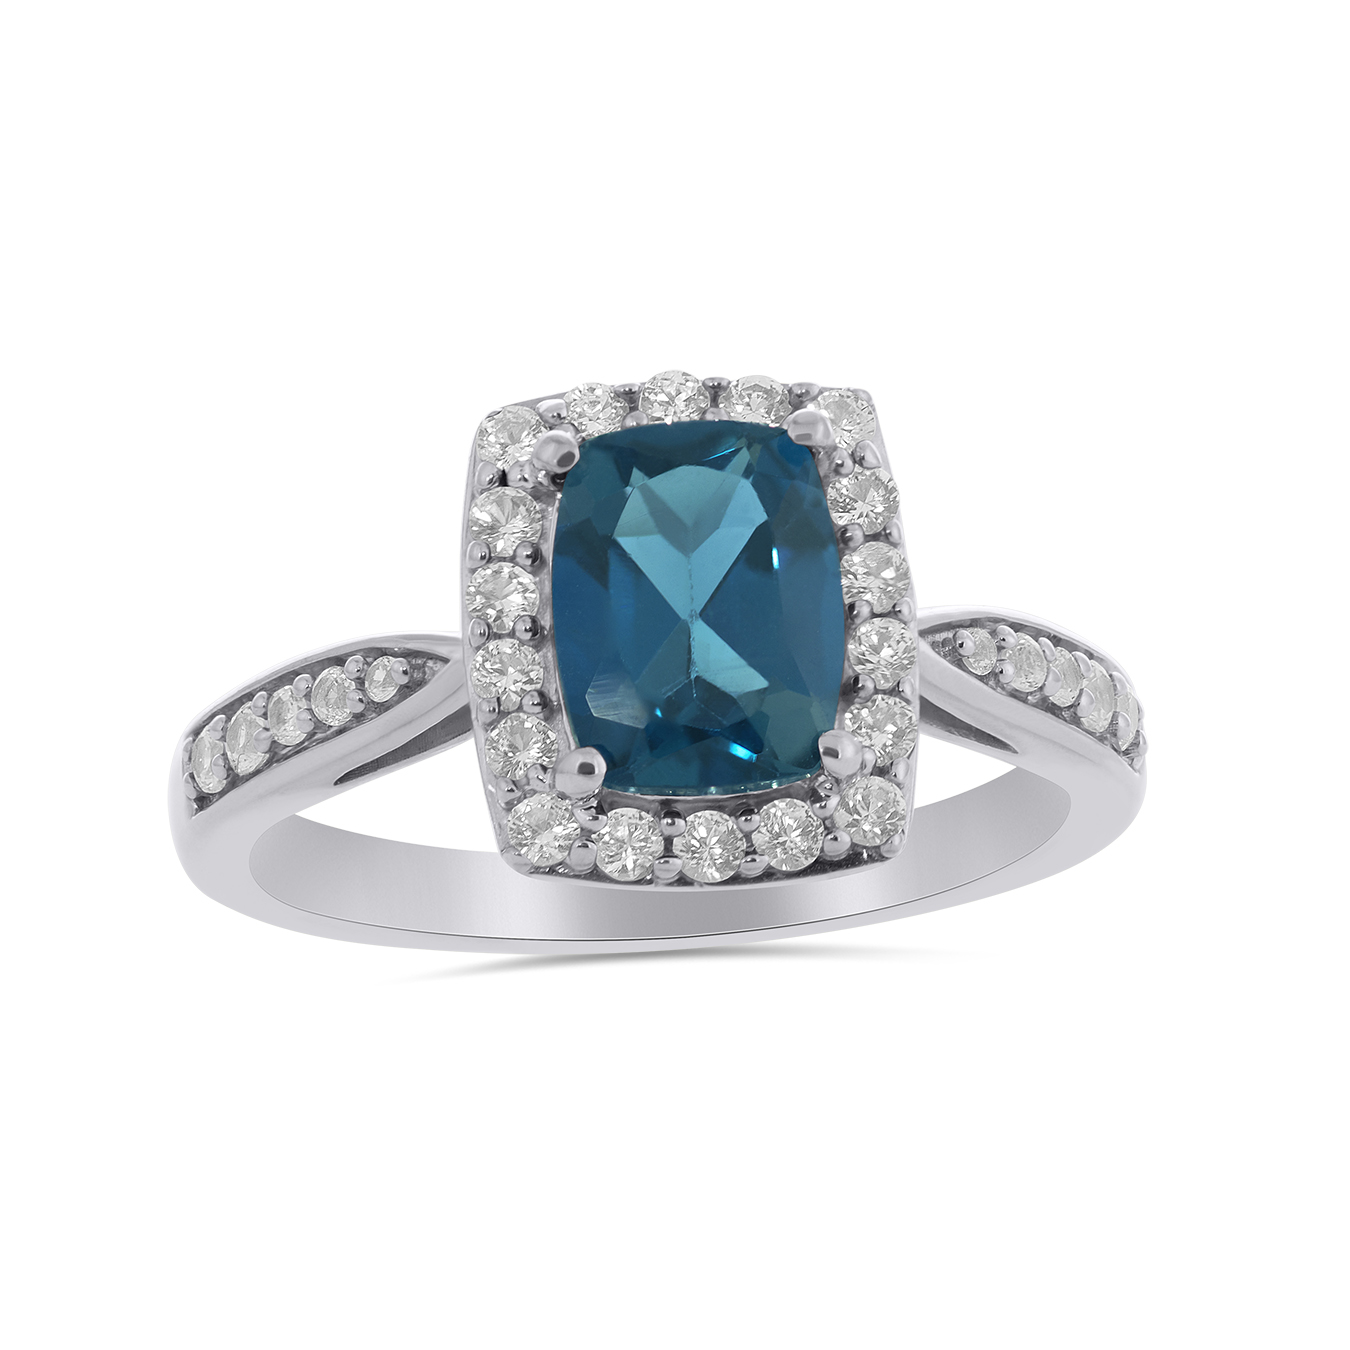 Size P Ivy Gems Sterling Silver Gorgeous Opal Sapphire /& Diamond Ring BNIB